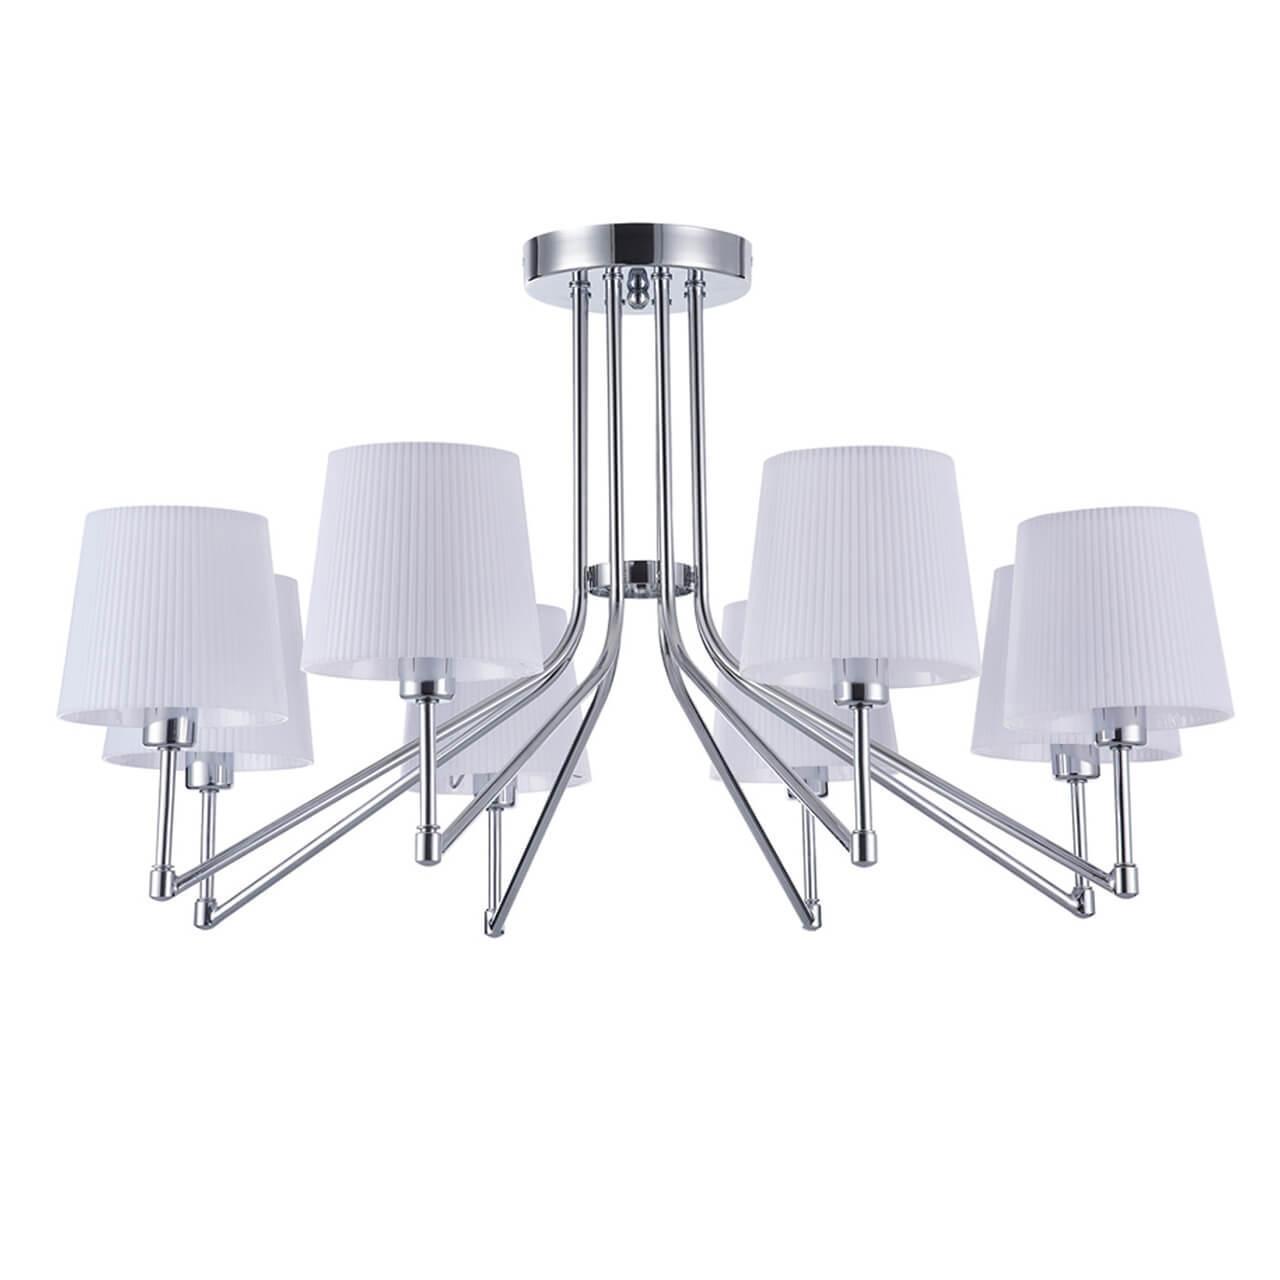 Потолочный светильник Freya FR5051-CL-08-CH, E14, 60 Вт люстра freya freya fr5051 cl 08 ch